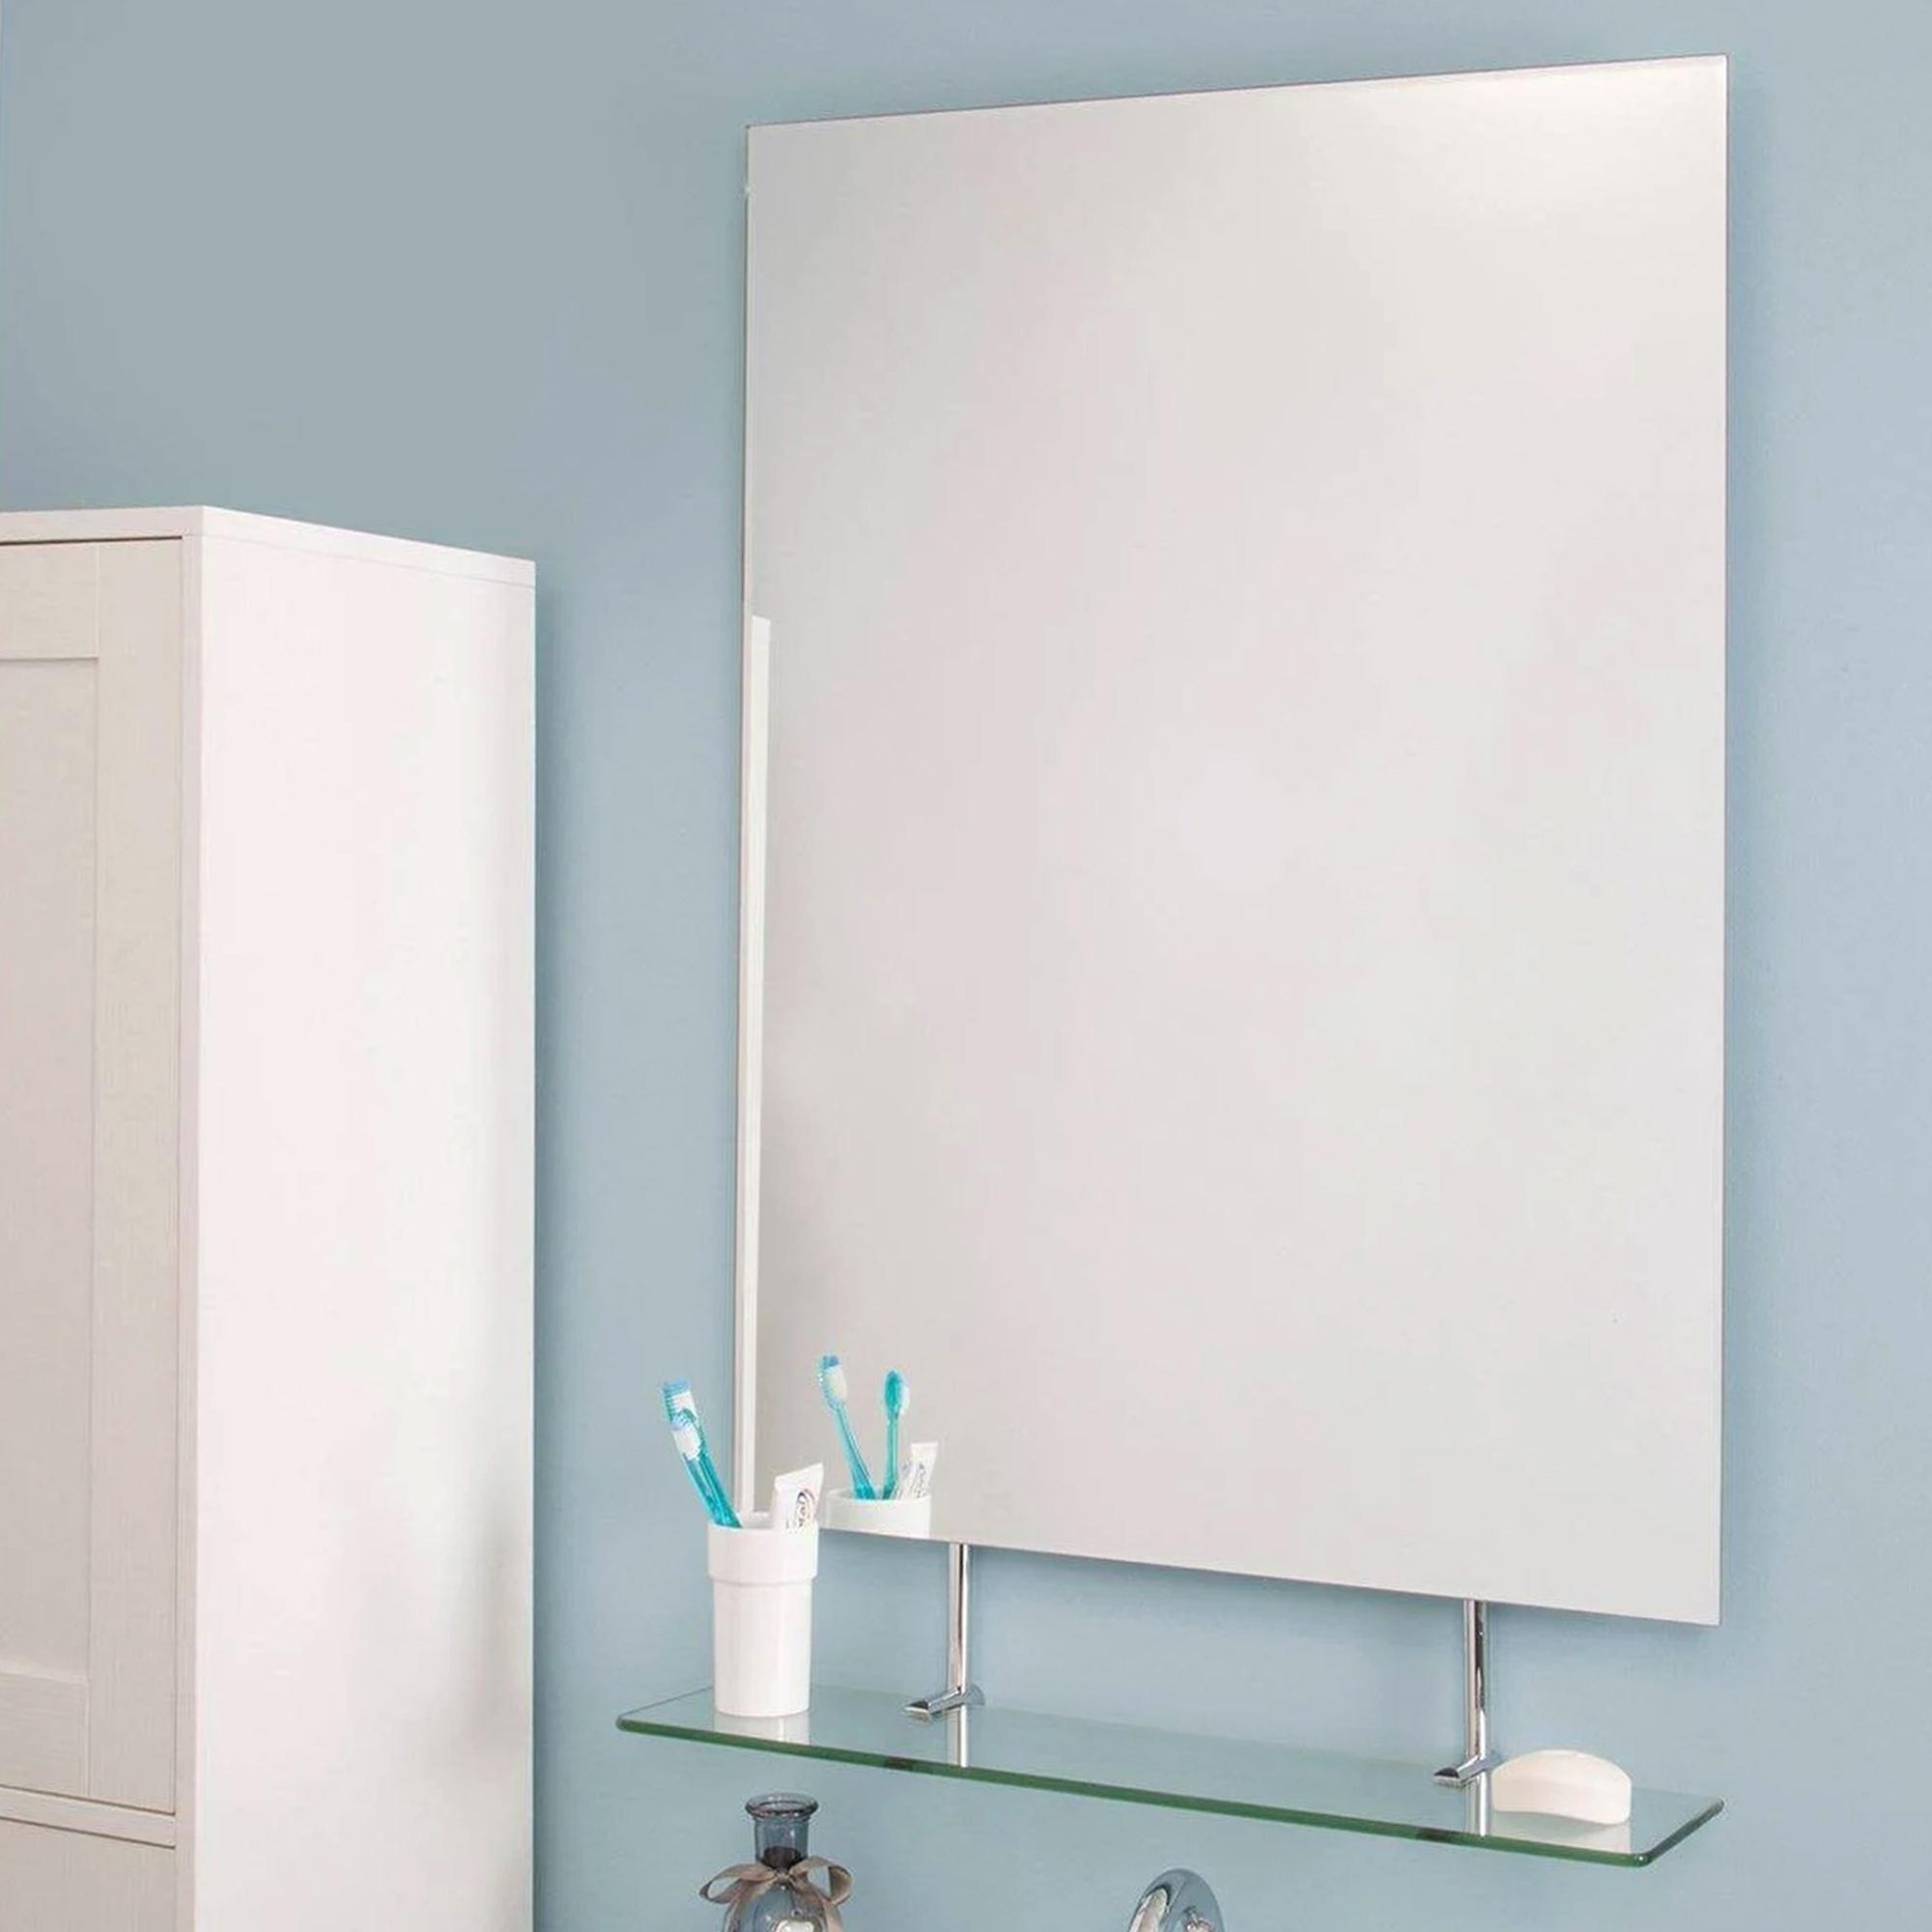 Croydex Helton Large Wall Hanging Bathroom Mirror Glass Cosmetic Shelf 95x65cm Ebay